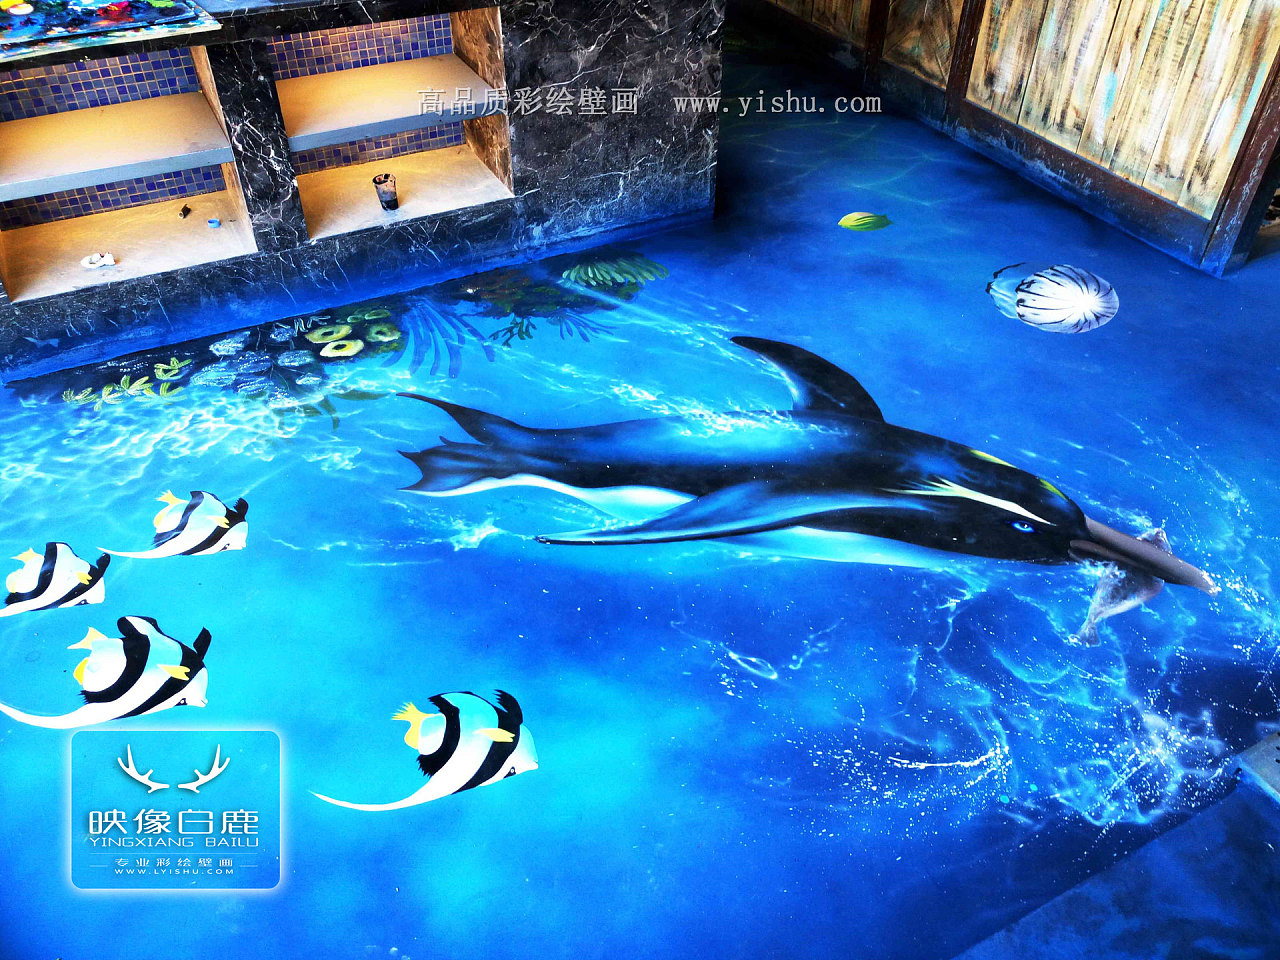 3d立体画 地面立体画 海底世界 隐形画 国画 油画 卡通 涂鸦 文化墙